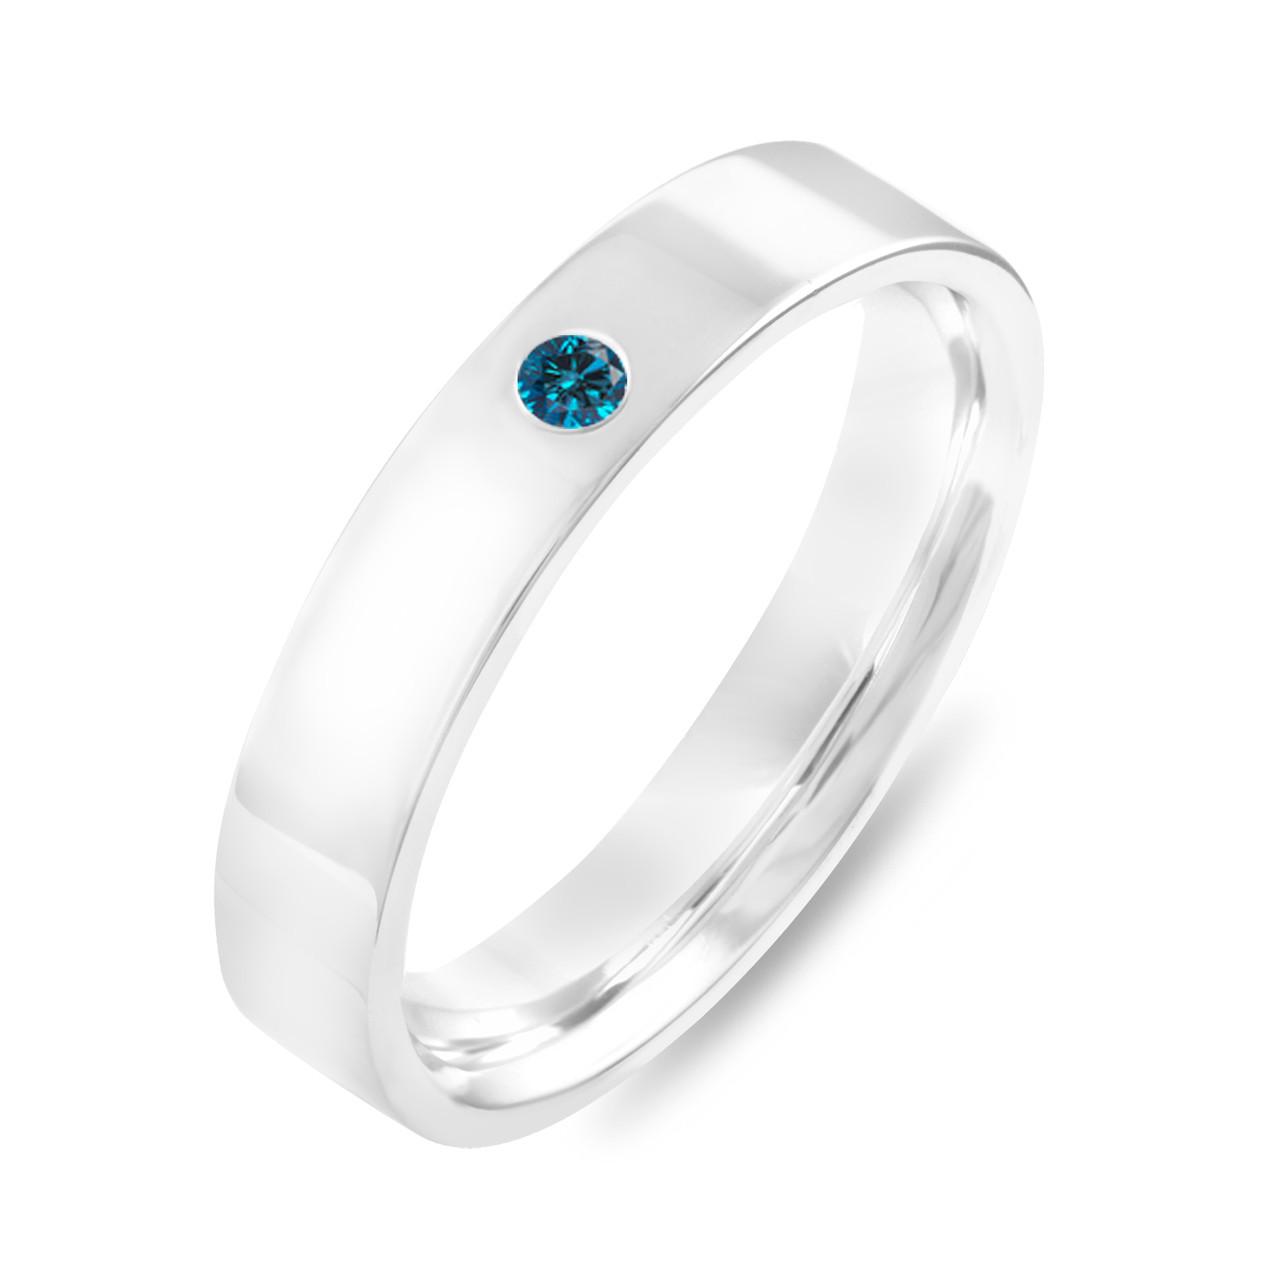 Mens Wedding Bands With Diamonds.Blue Diamond Wedding Ring Diamonds Wedding Band Unisex Wedding Band Mens Flat Wedding Band 4 Mm Anniversary Band 14k White Gold Handmade